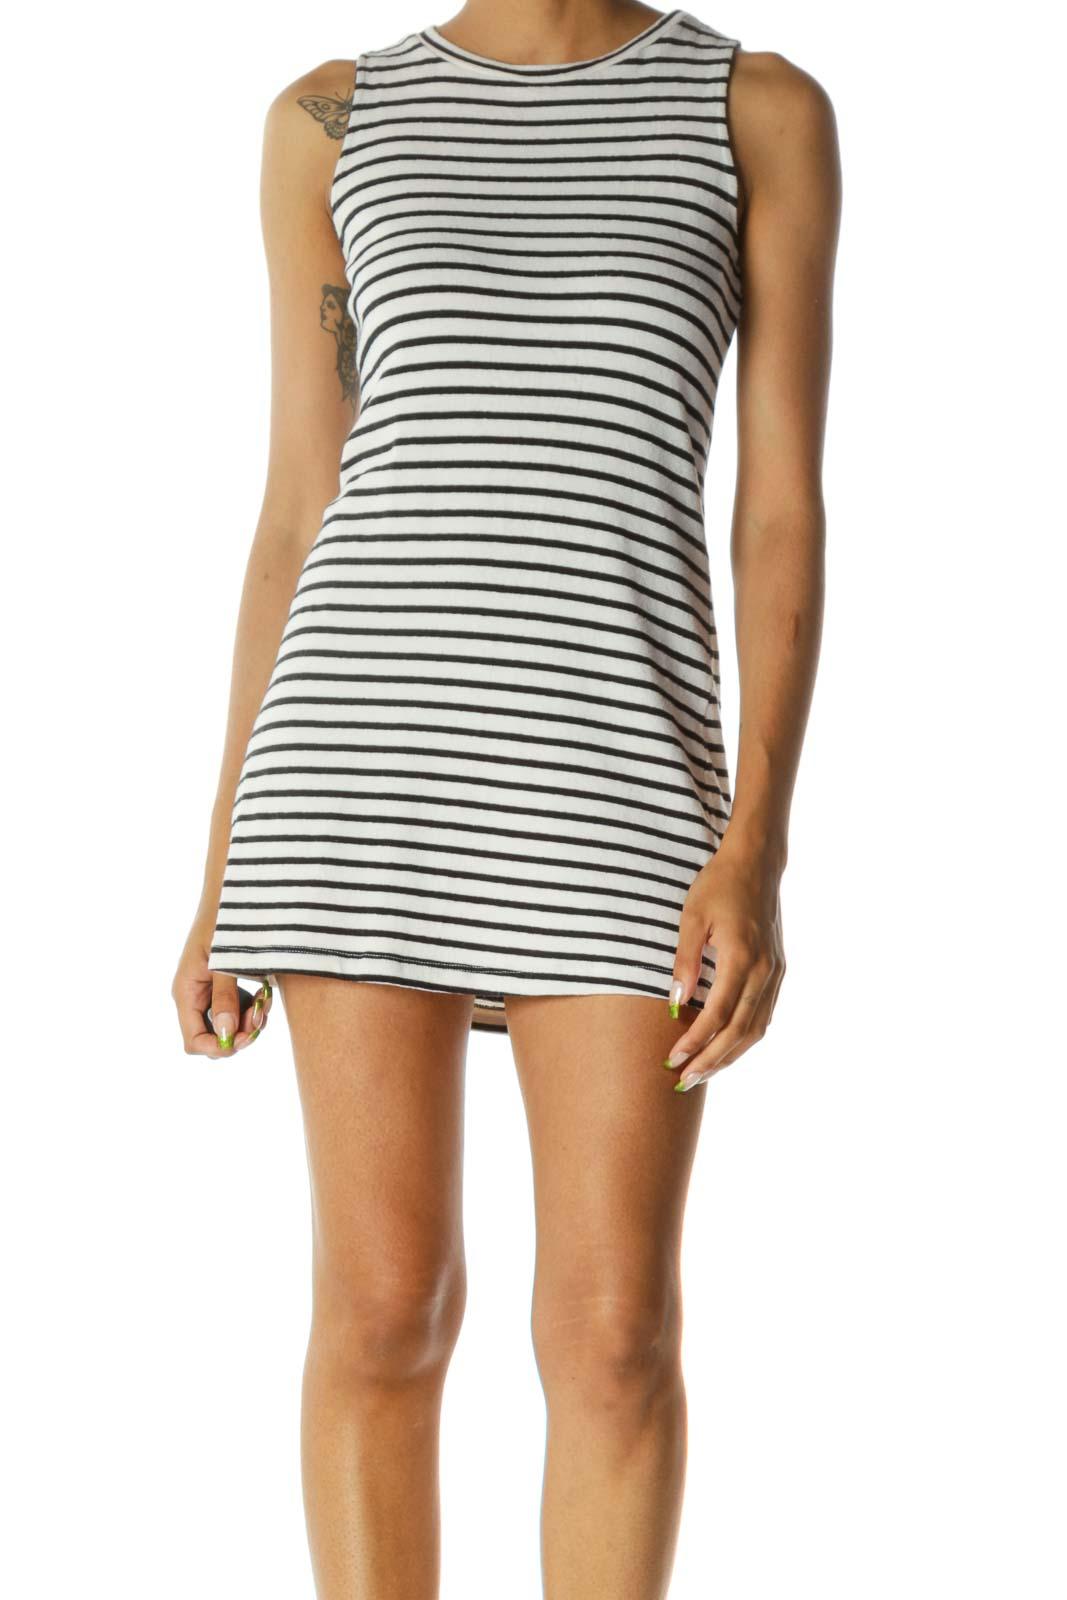 Black White Round Neck Striped Stretch Knit Dress Front